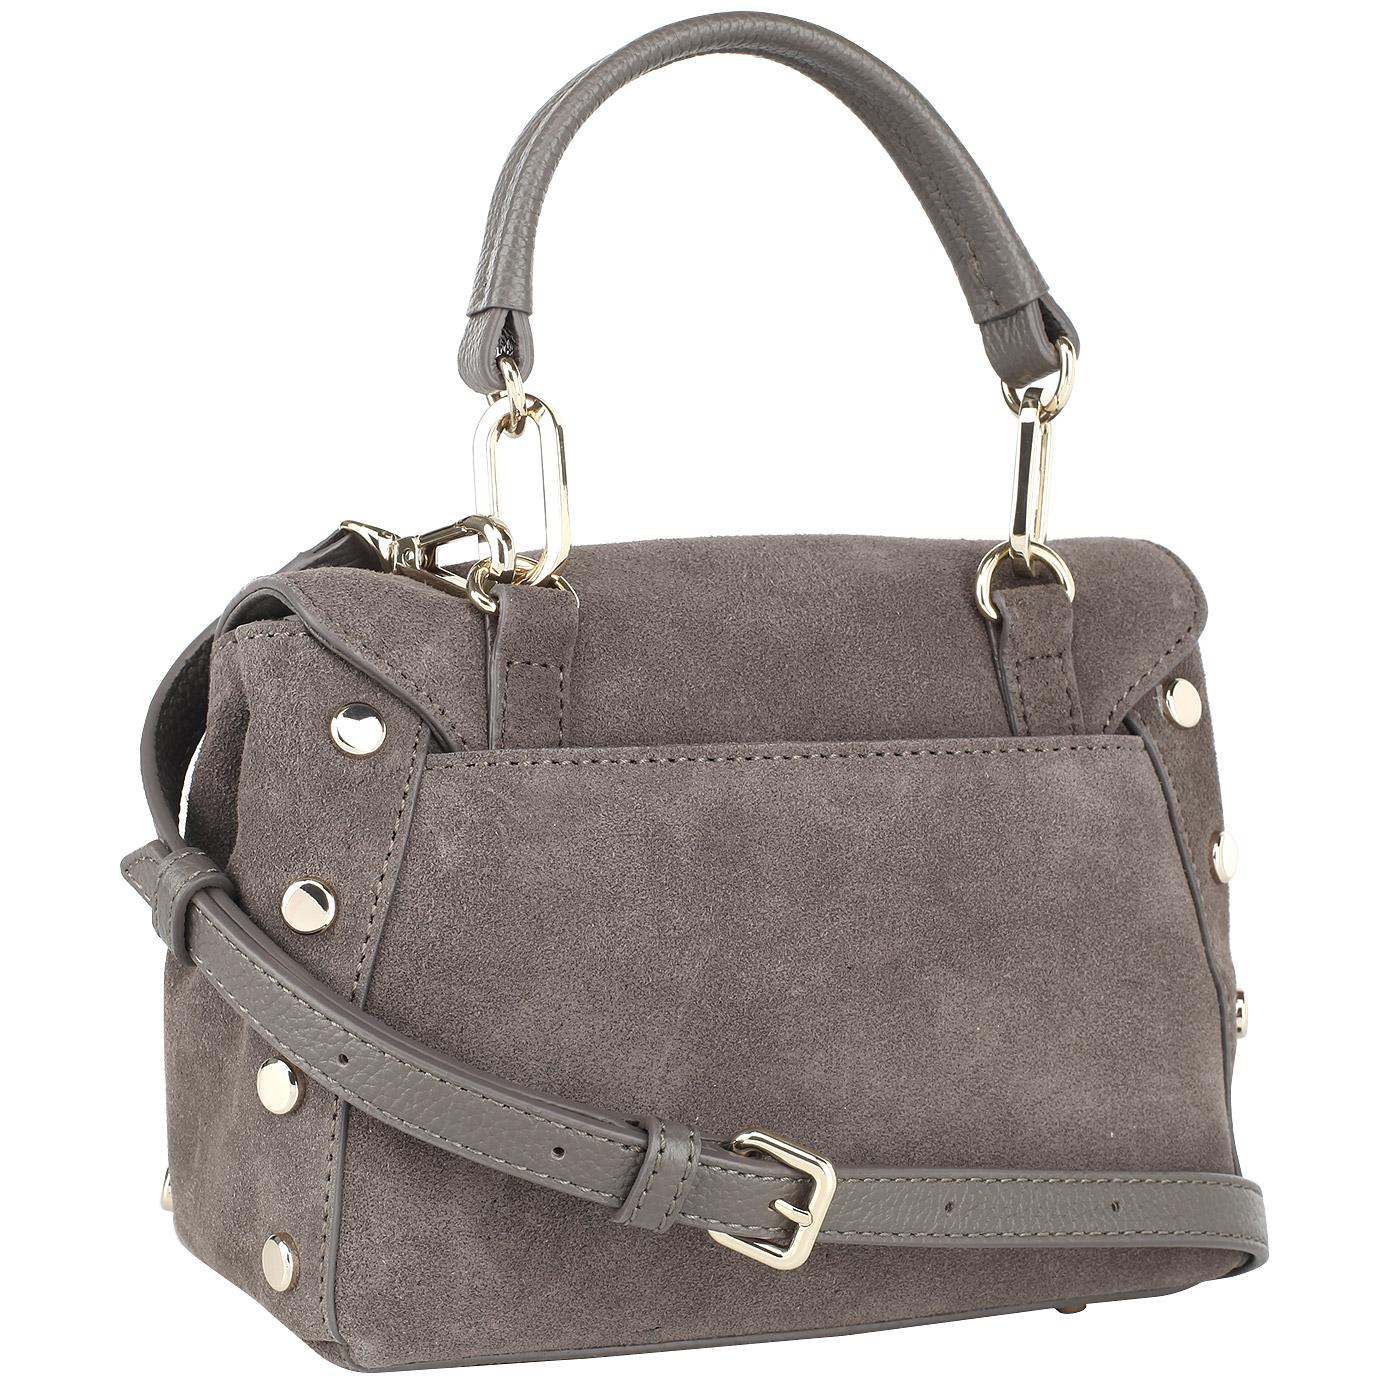 5f1d3cbe18b0 Маленькая замшевая сумочка с металлическим декором DKNY Suede ...